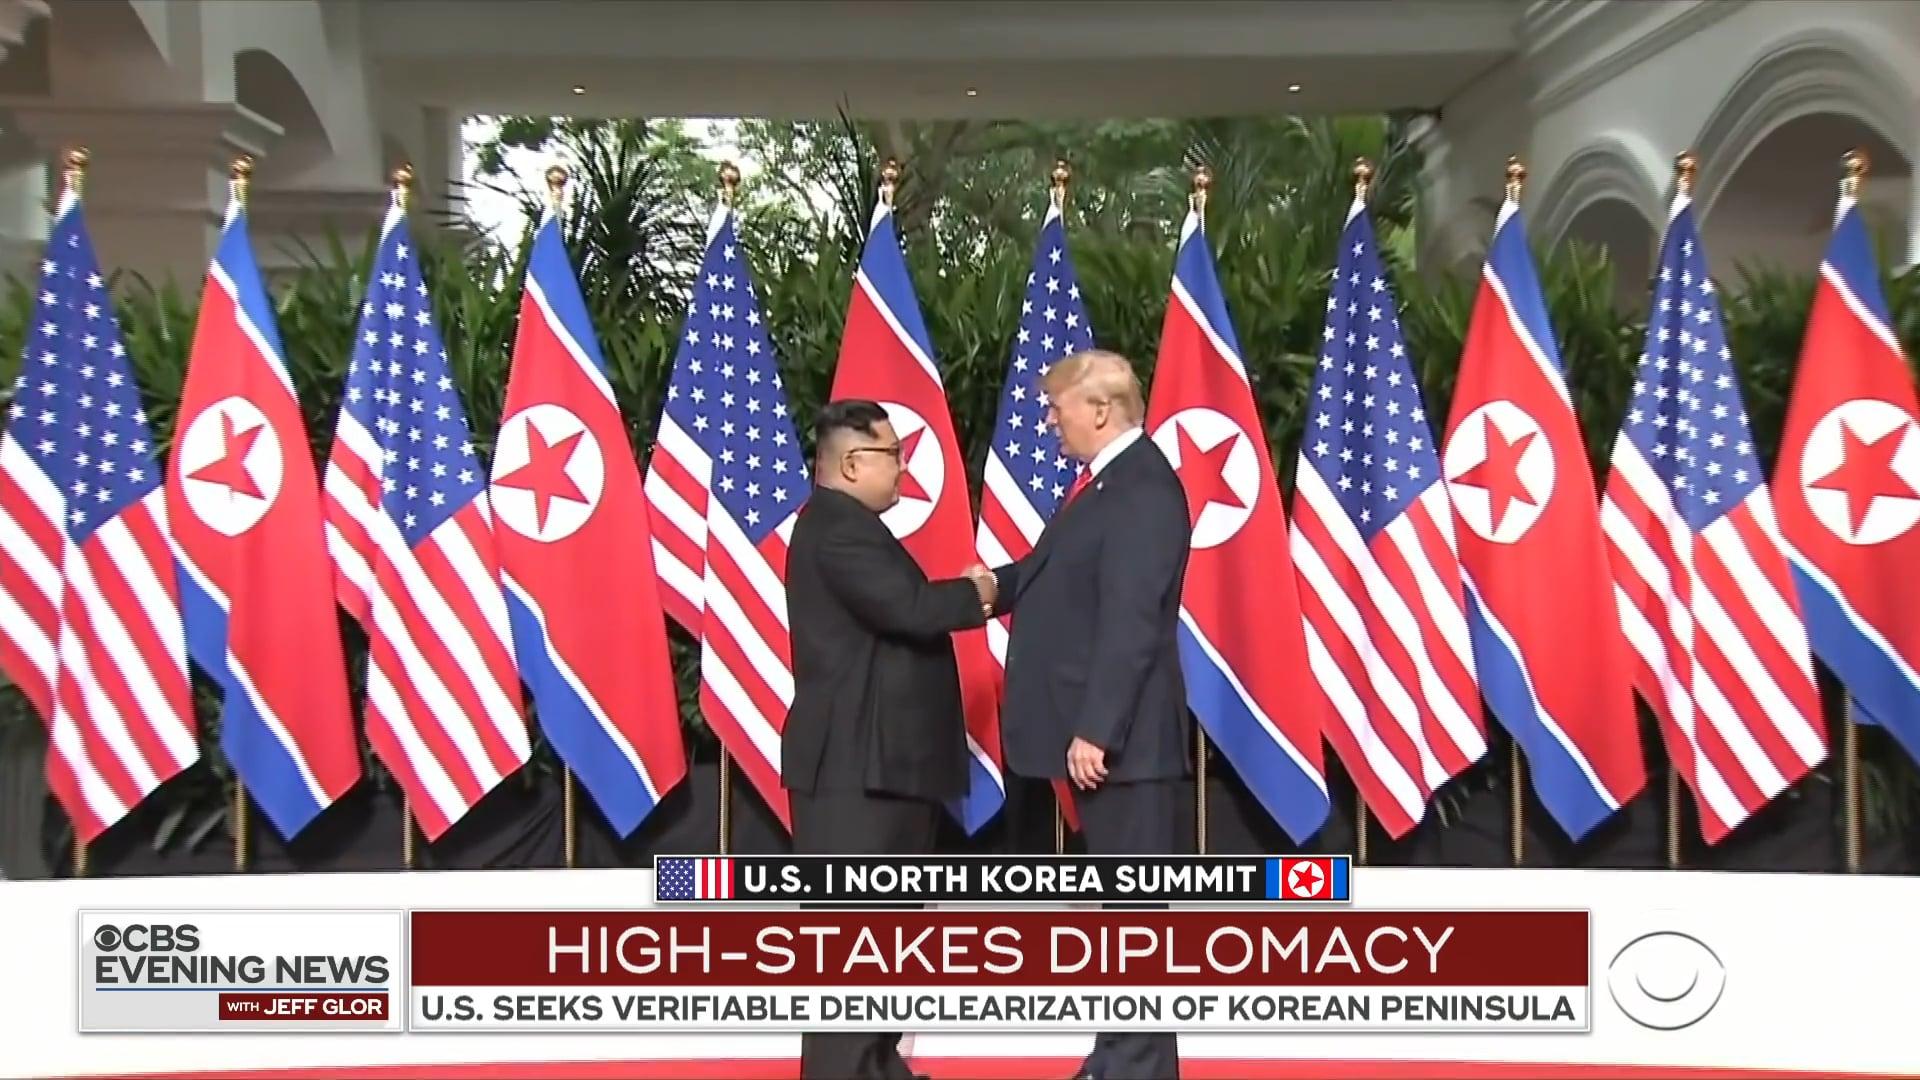 CBS NEWS - Trump and Kim Jong Un Vietnam Summit (2019)